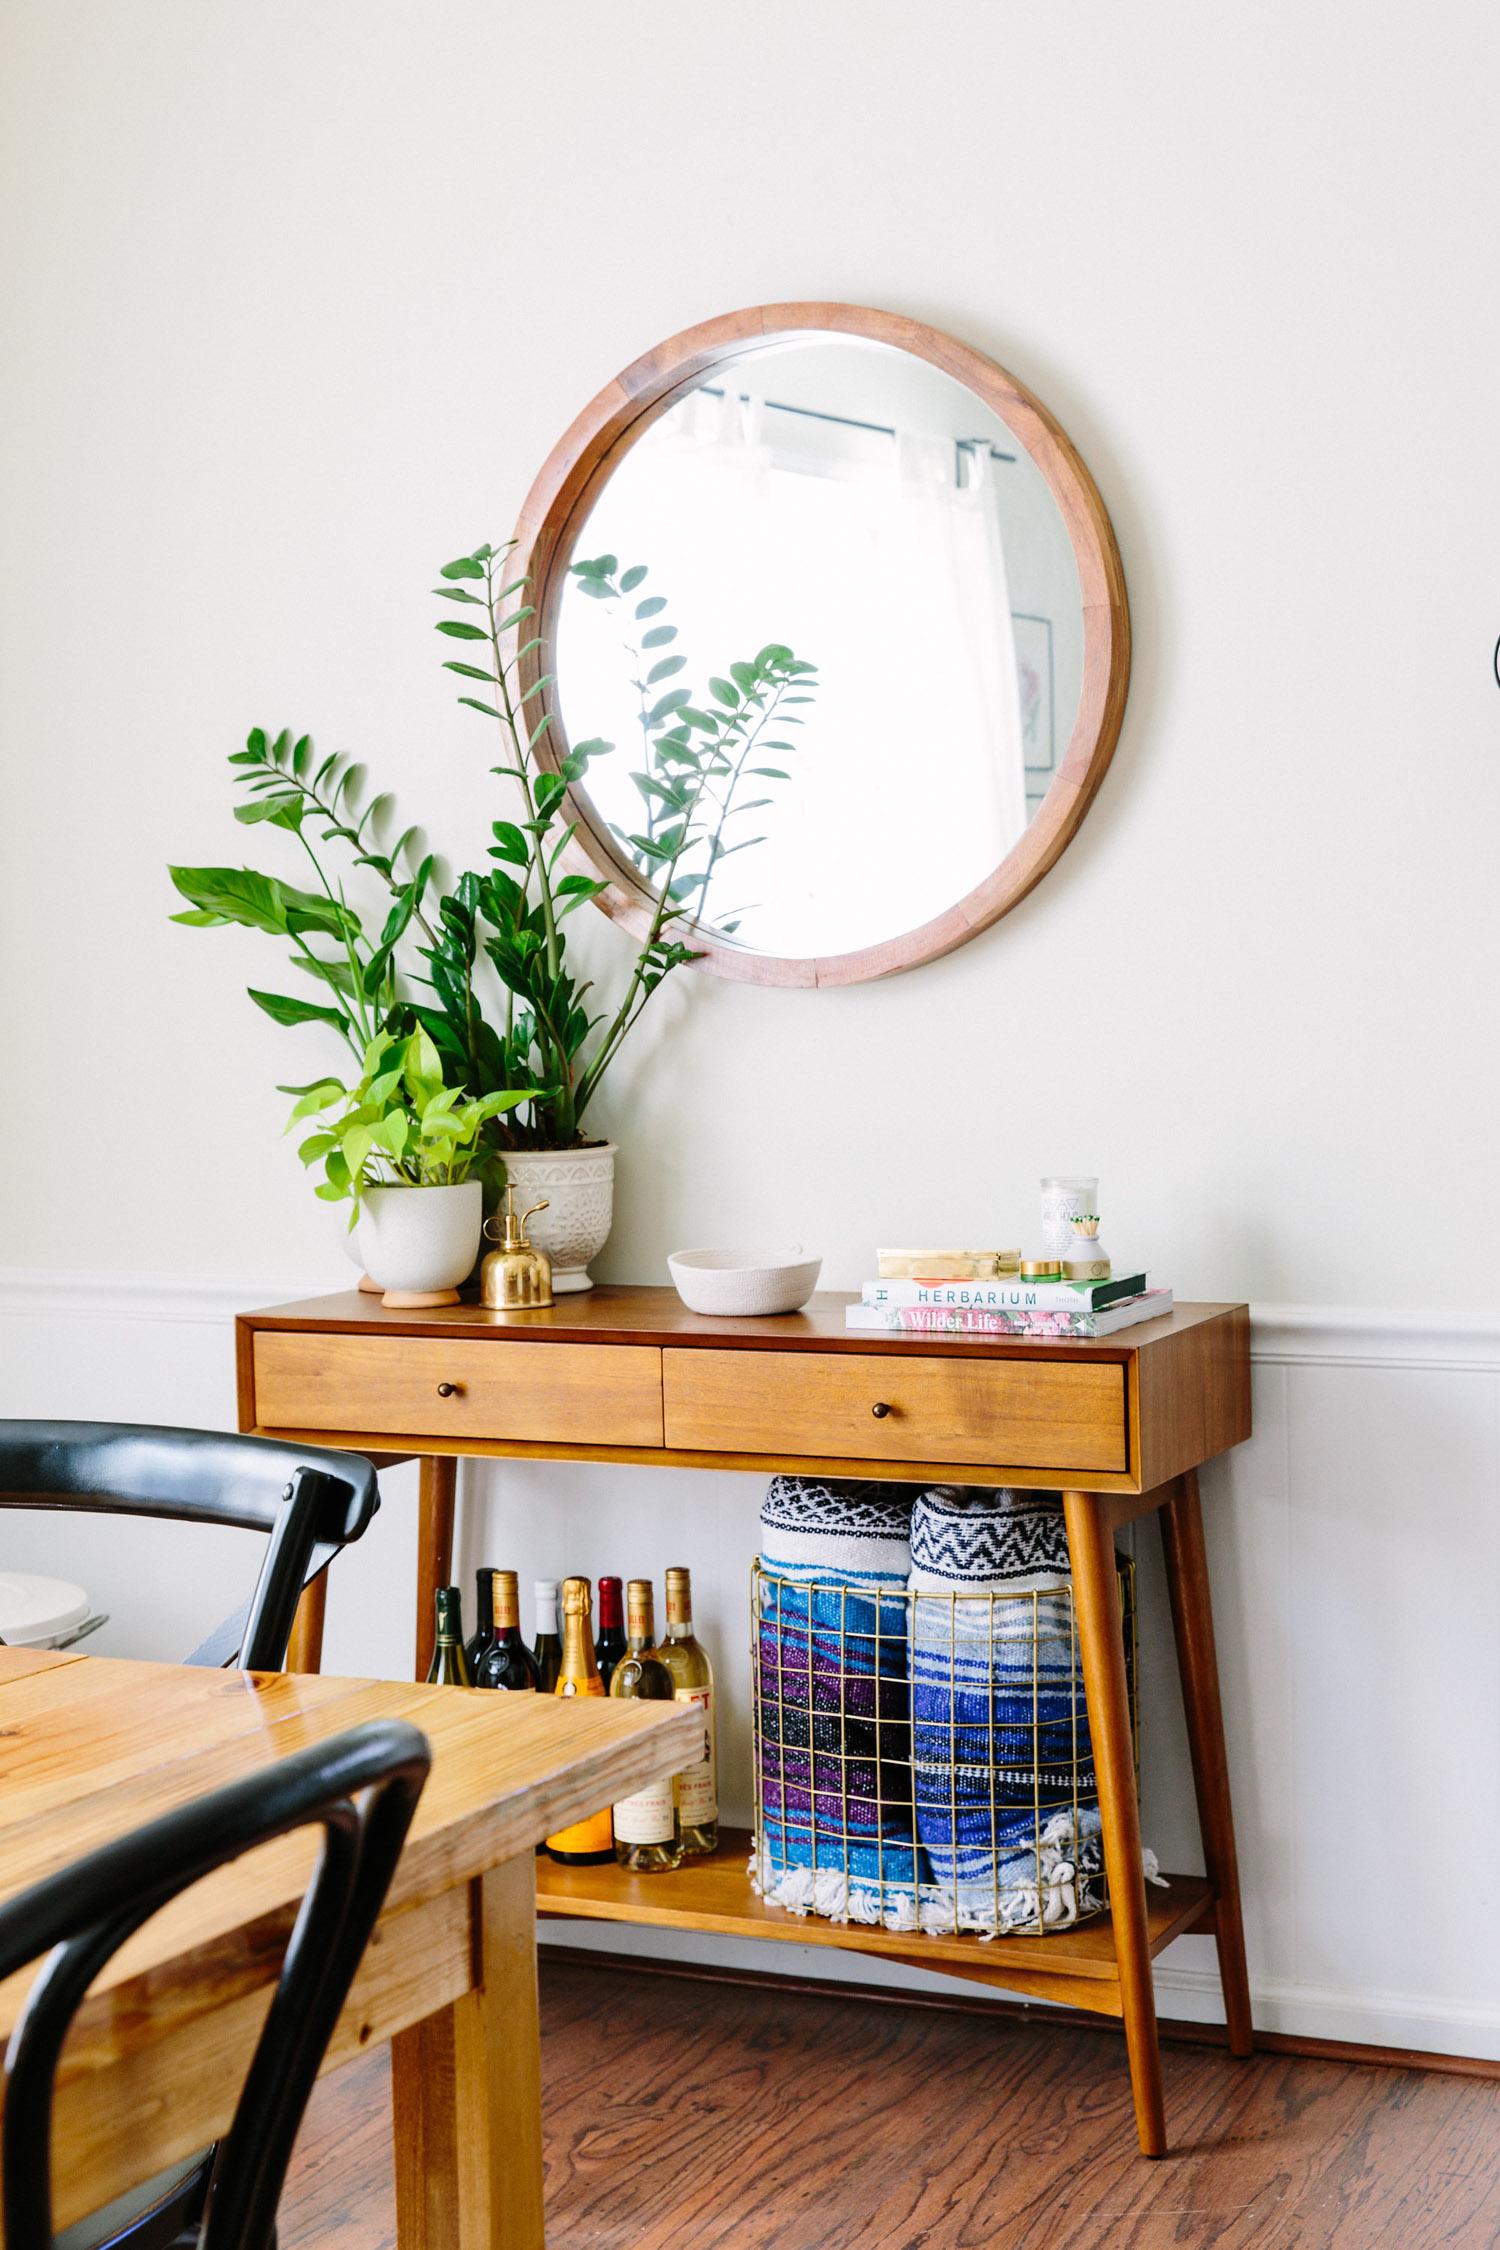 west elm mid century console copy cat chic. Black Bedroom Furniture Sets. Home Design Ideas